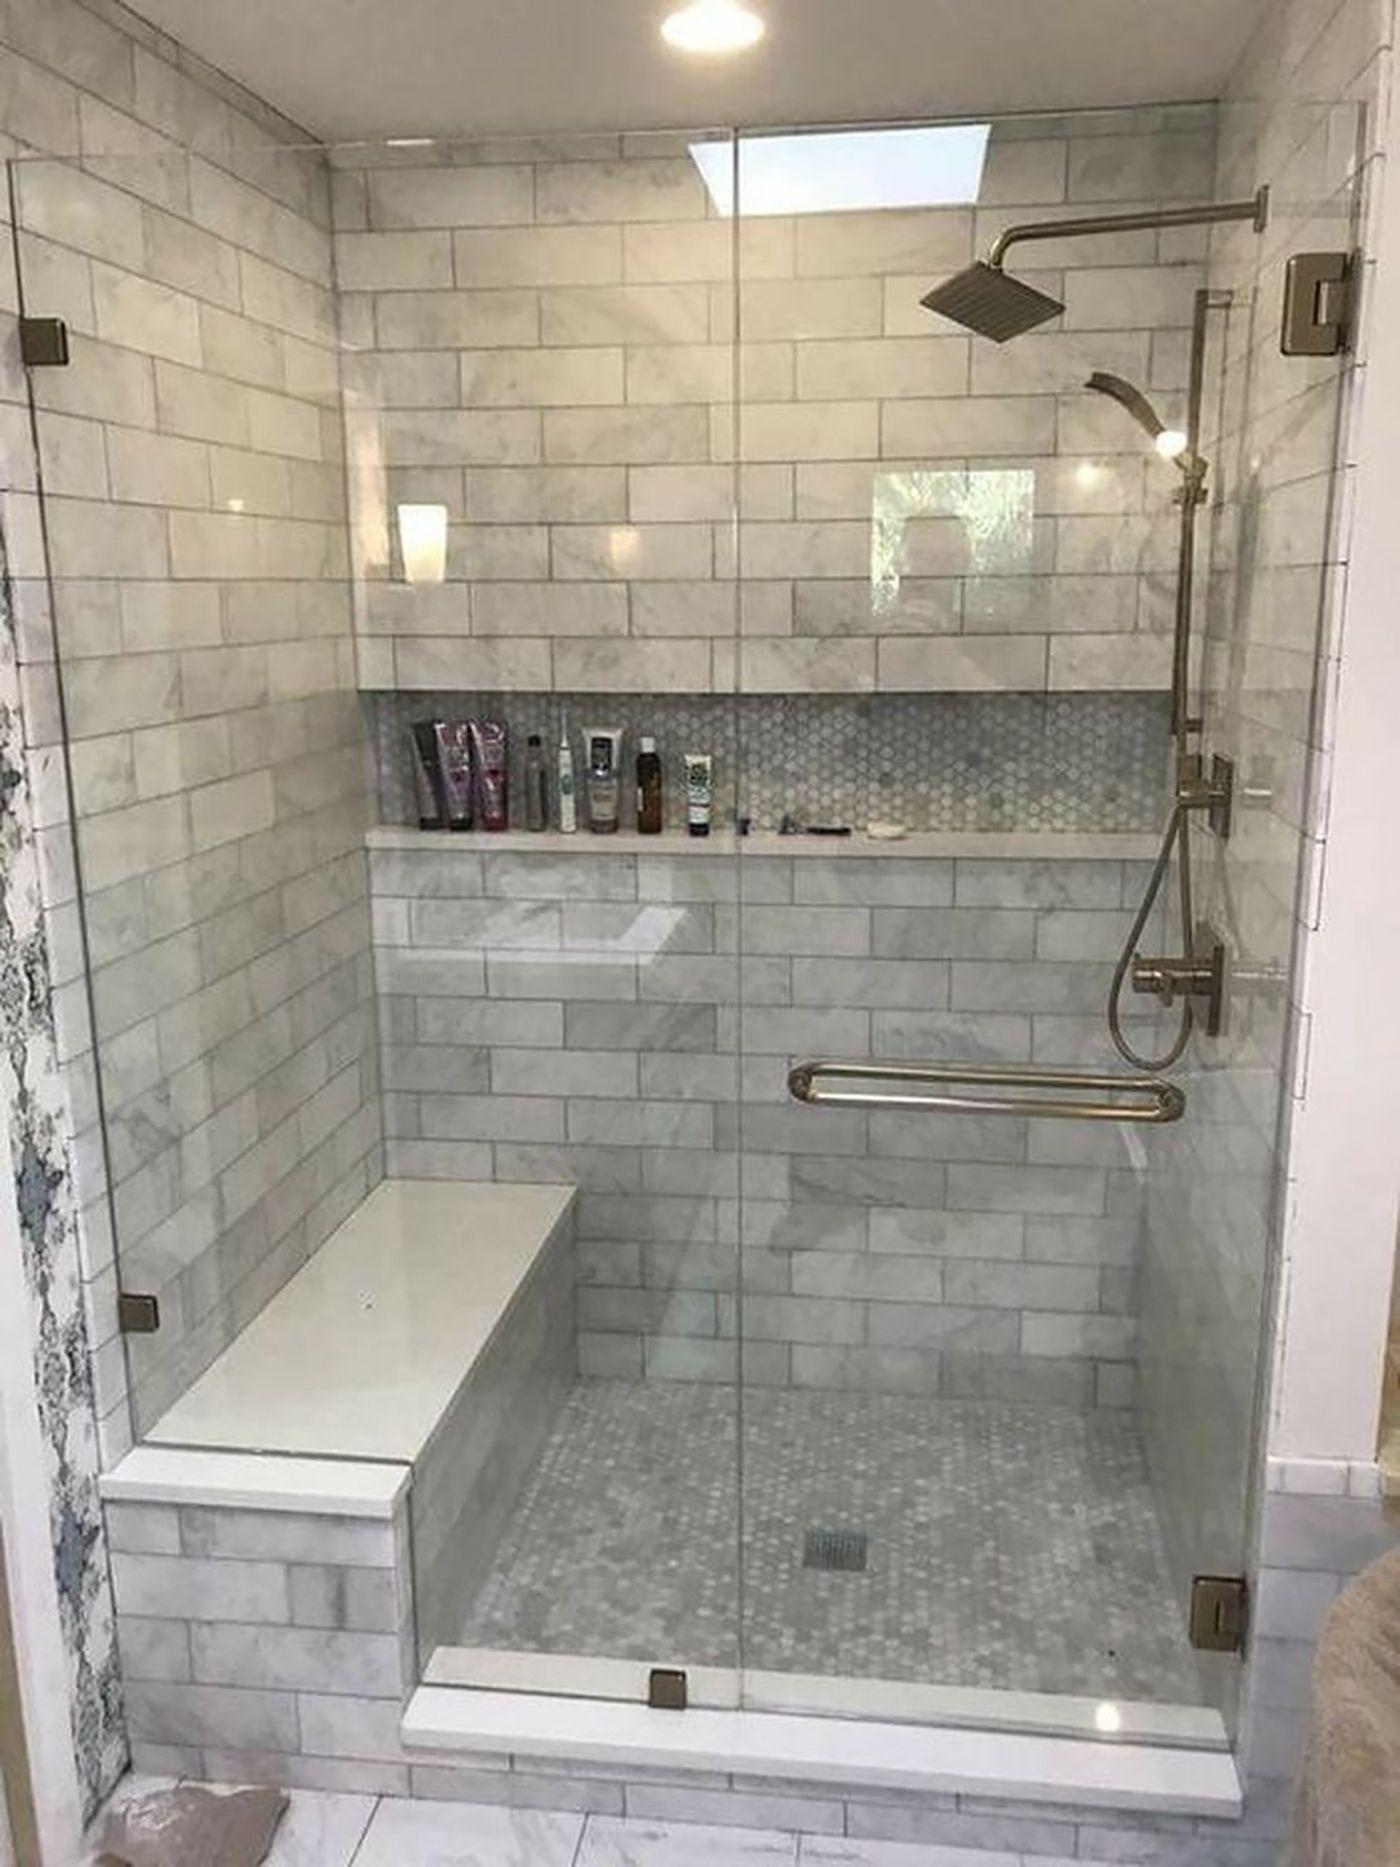 half bathroom remodel in 2020 20 amazing ideas and on bathroom renovation ideas 2020 id=74749